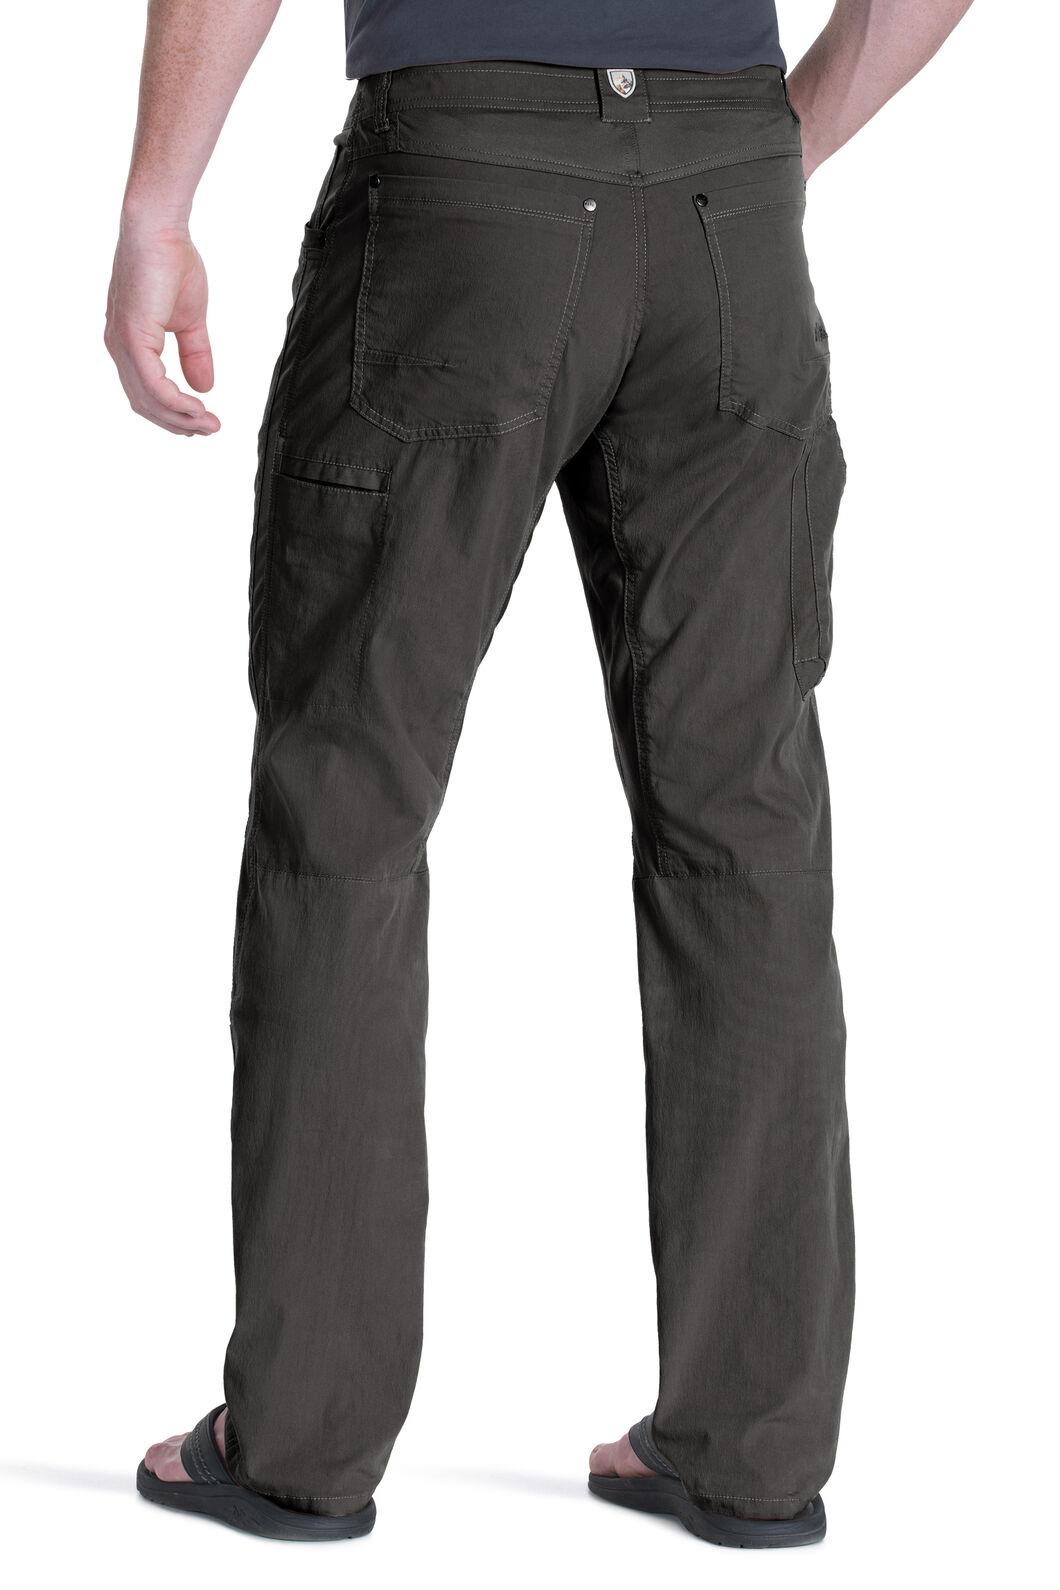 Kuhl Radikl Pants 34 Inch Leg Men S Macpac